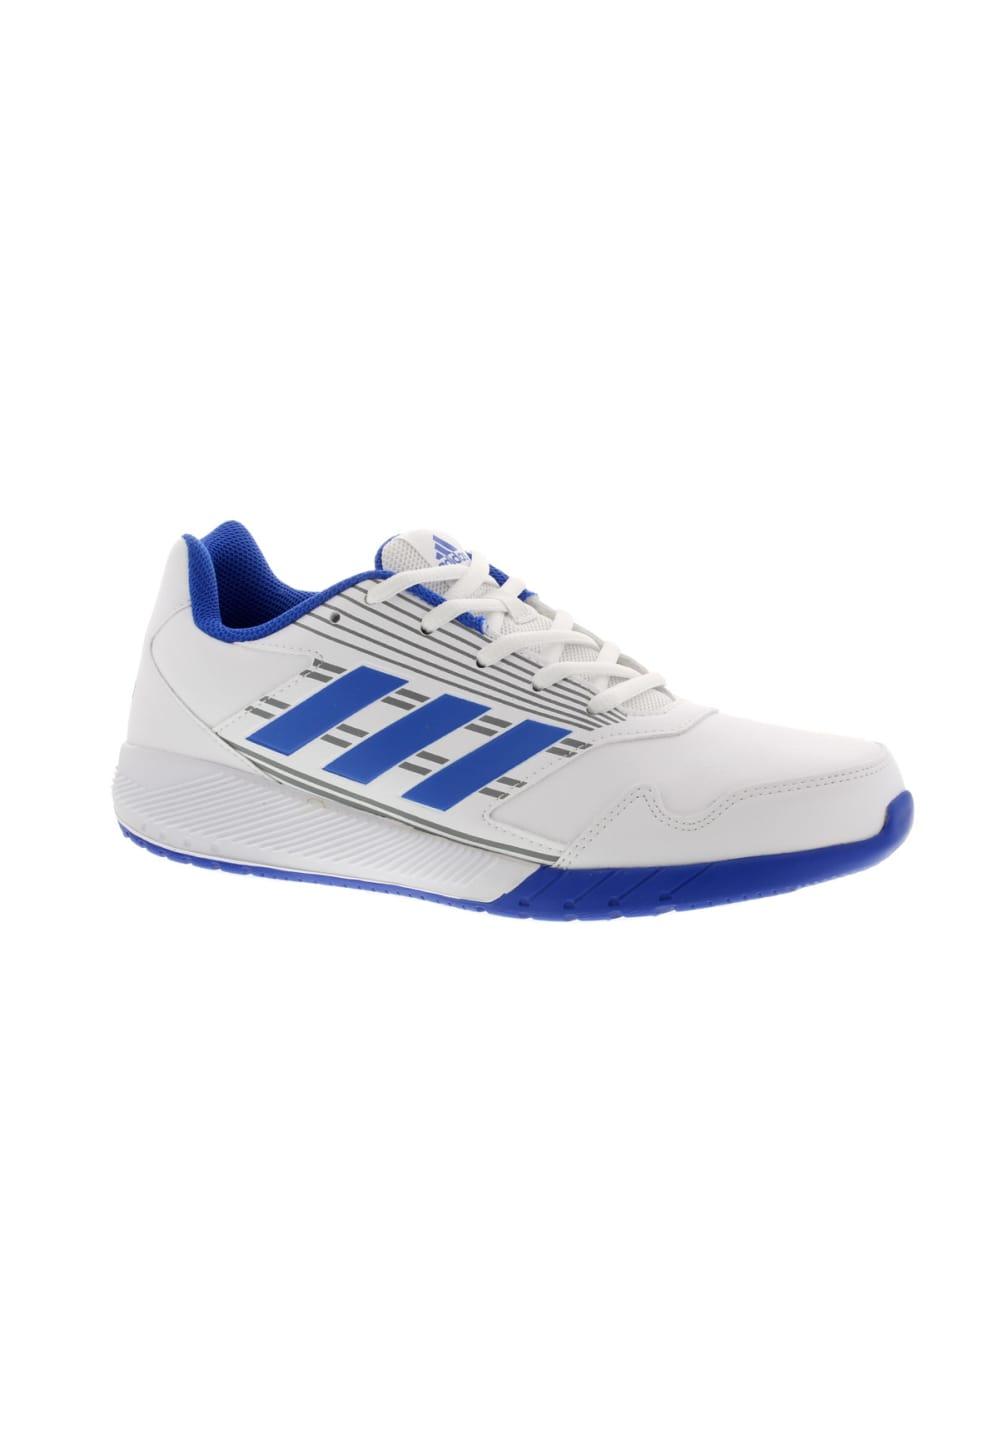 c21c03dae8fd9 Next. -60%. adidas. Altarun K - Chaussures running